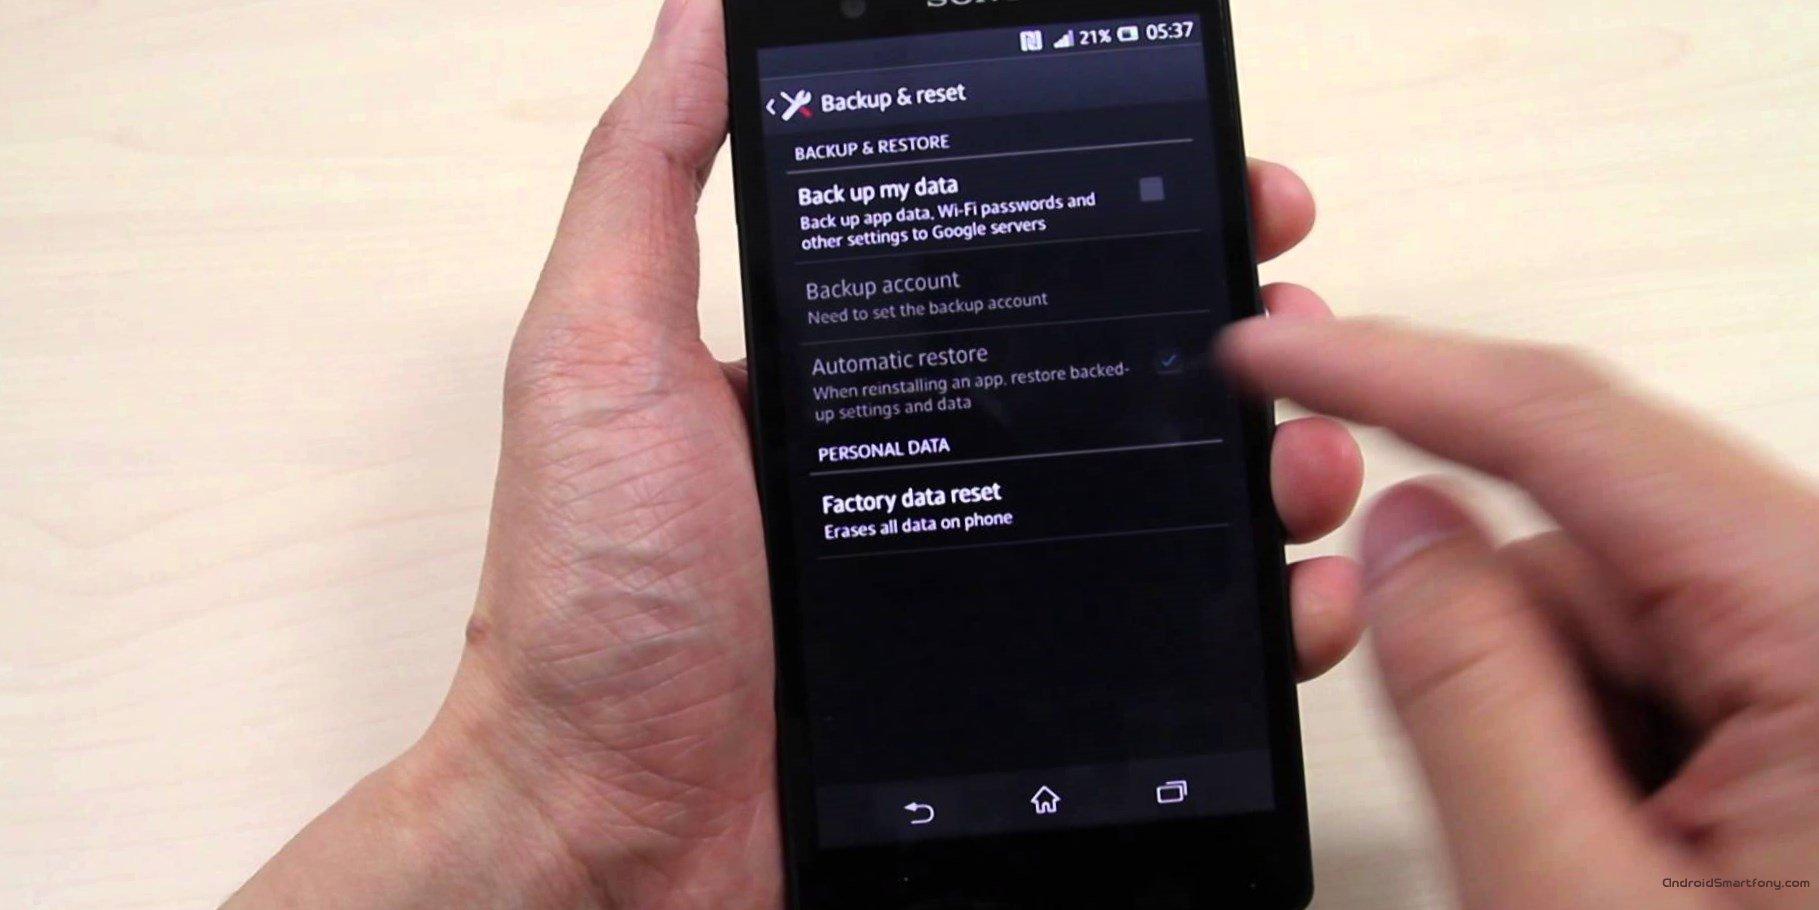 Sony xperia как сделать фото экрана на